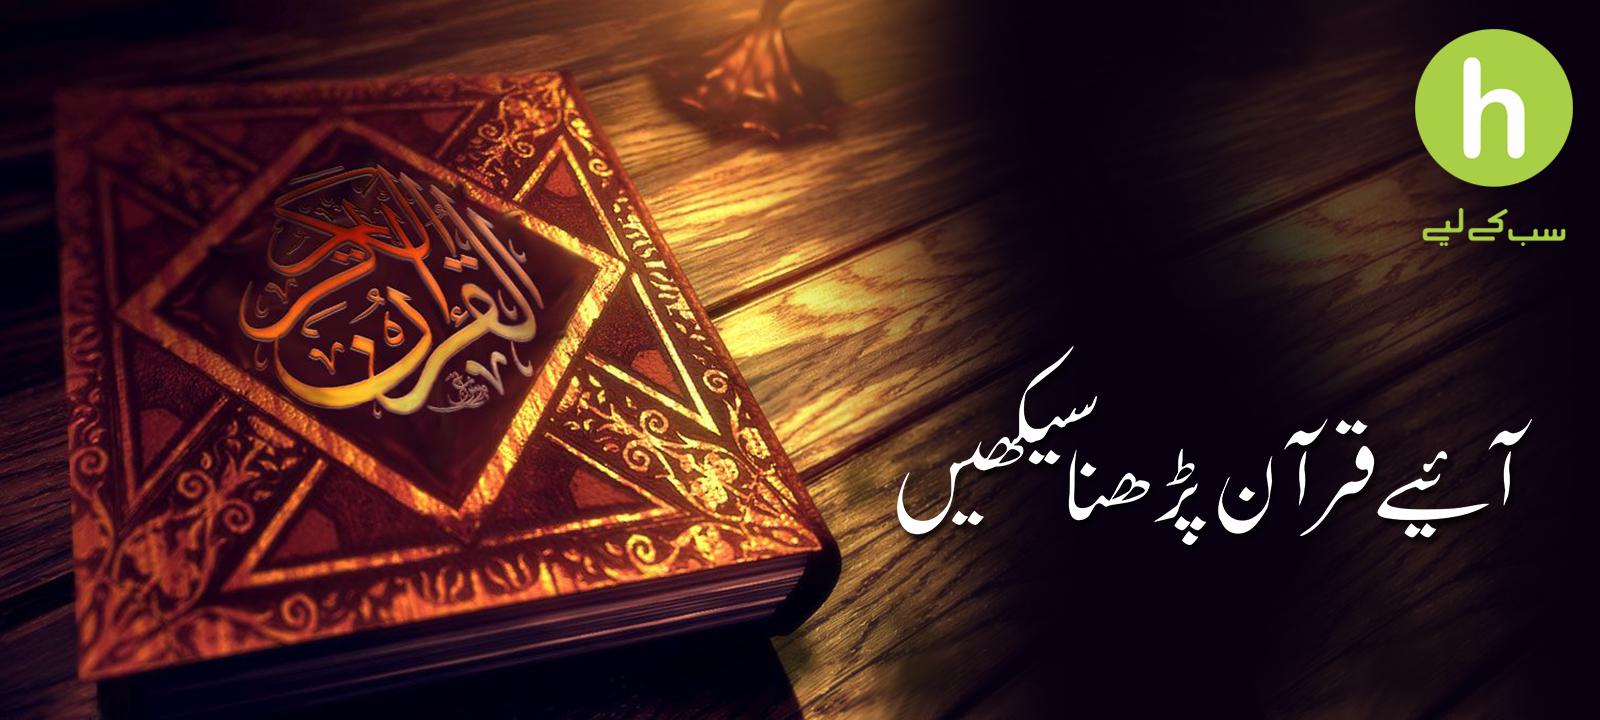 Aaiye Quran Parna Sekien